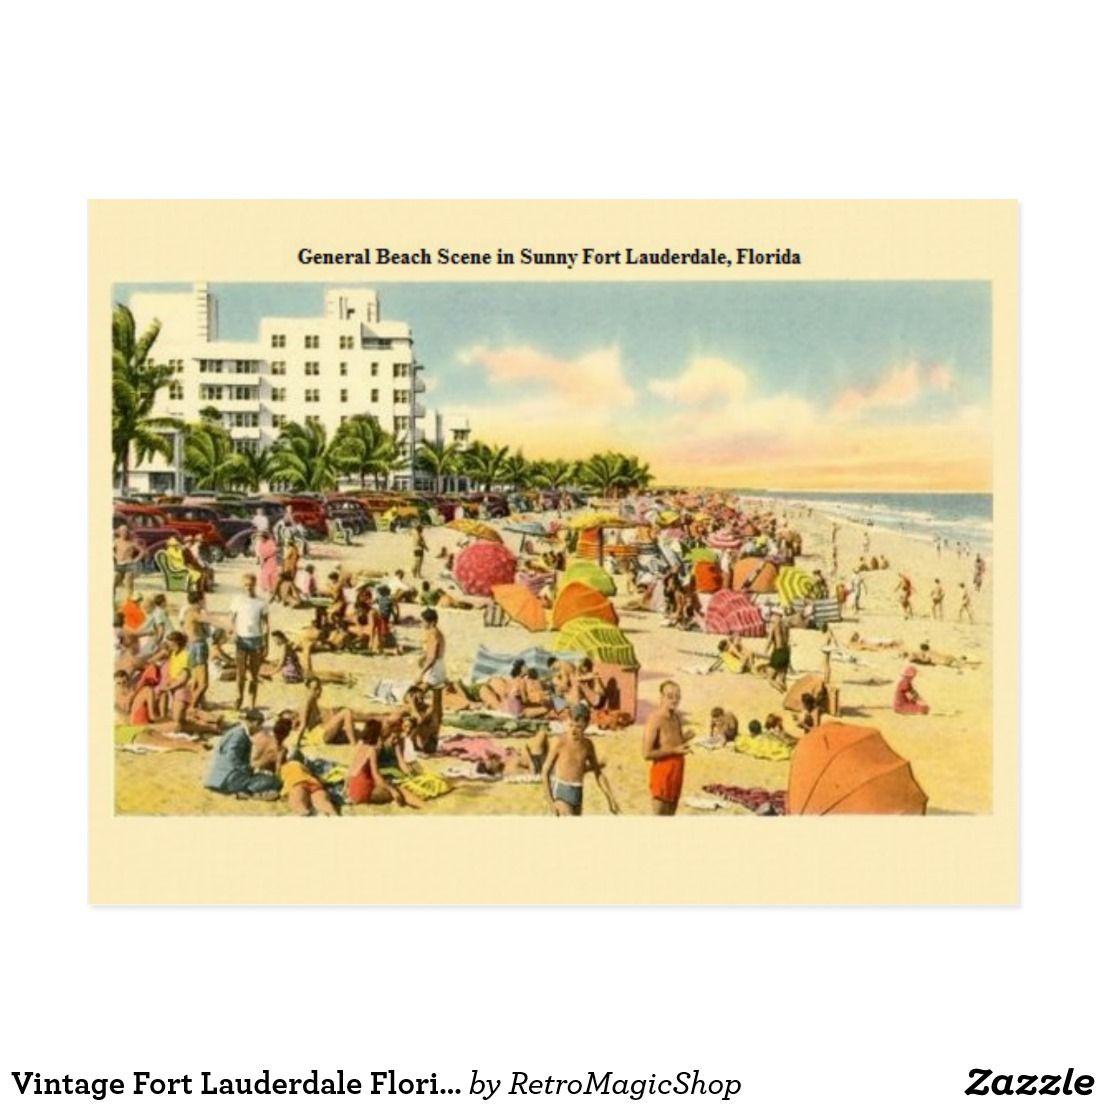 Vintage Fort Lauderdale Florida Beach Post Card Zazzle Com Vintage Postcards Travel Vintage Florida Vintage Postcard